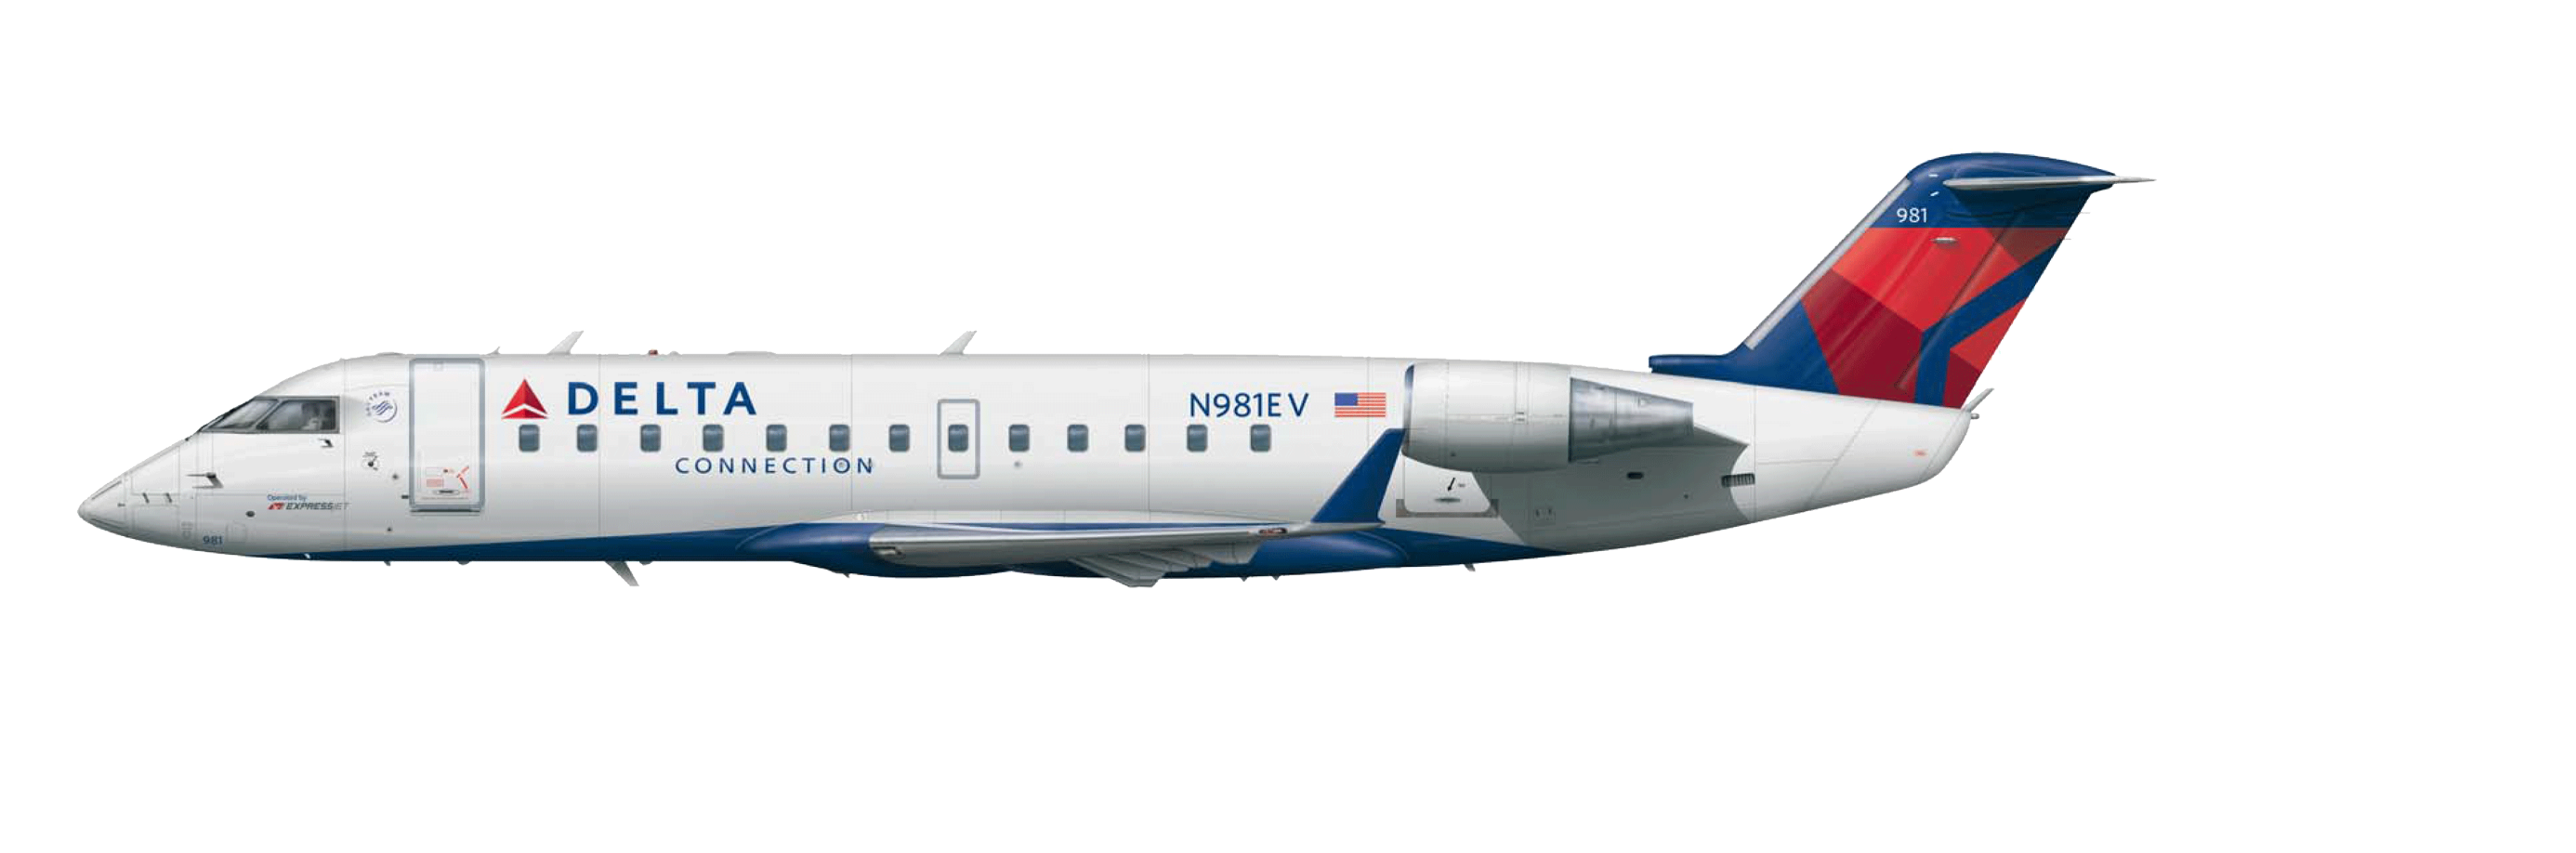 Bombardier CRJ-200 Aircraft Seat Maps, Specs & Amenities